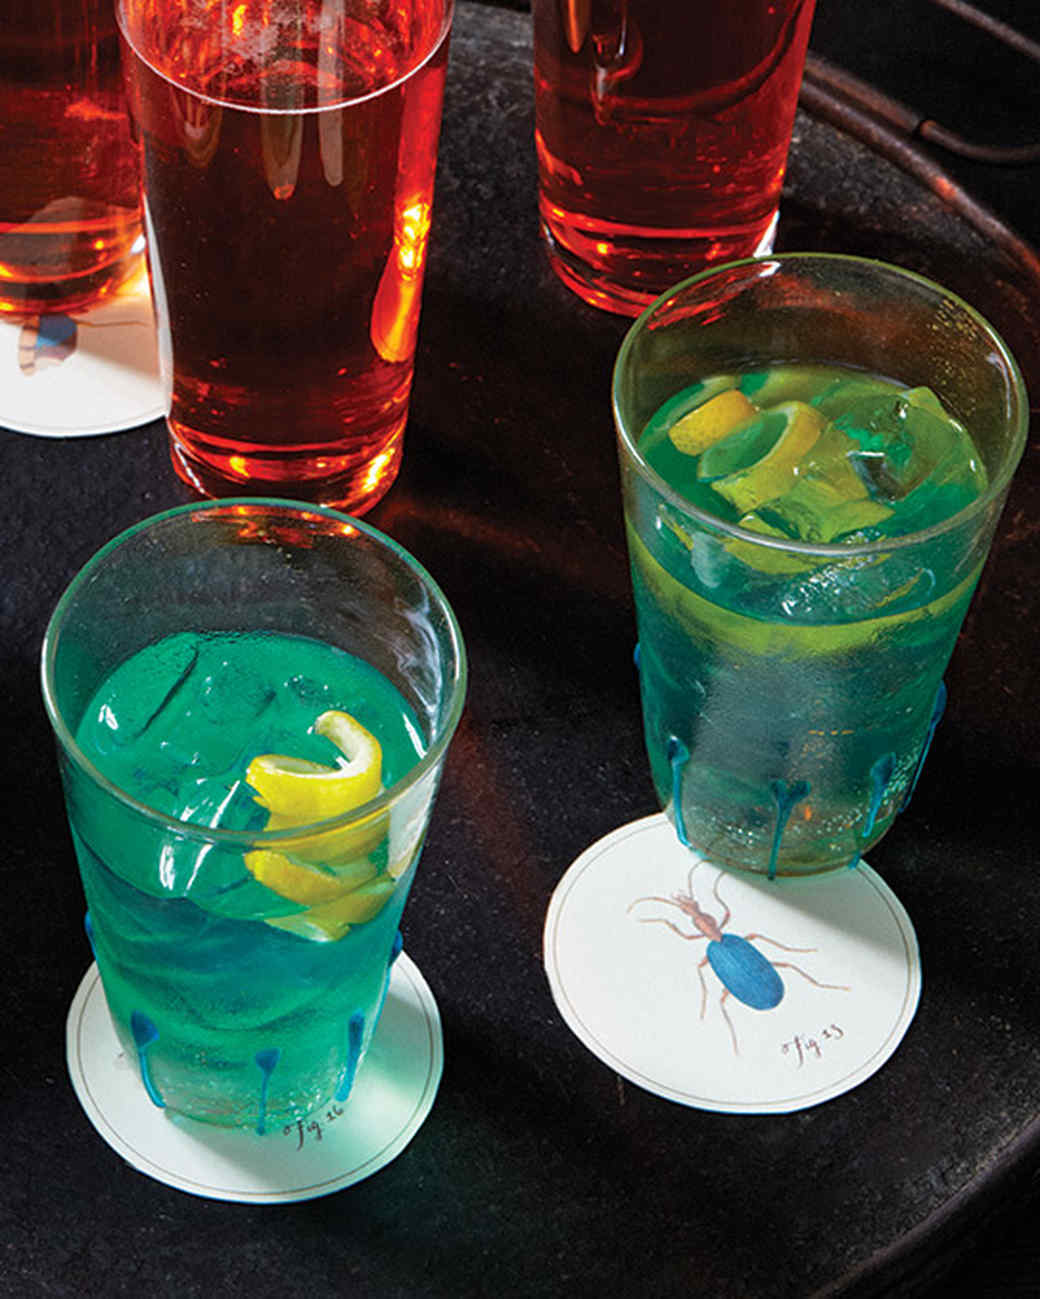 md106062_1010_halloween_0318_green_drinks.jpg